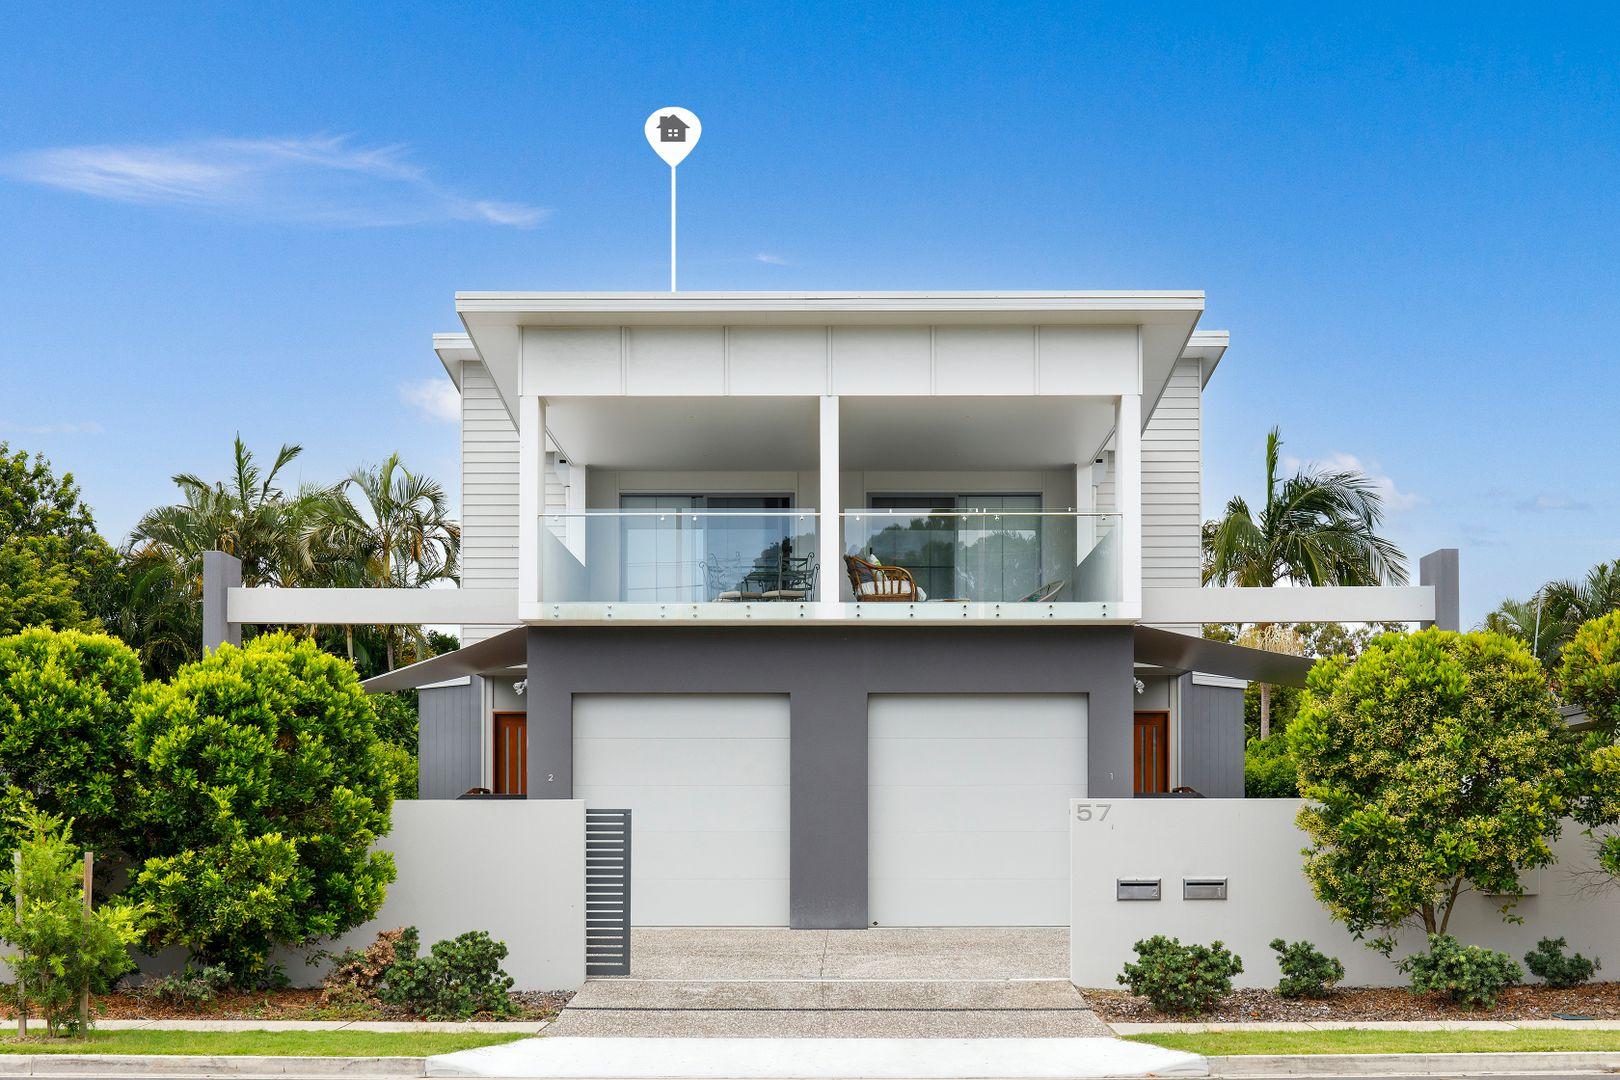 2/57 Hilton Terrace, Tewantin QLD 4565, Image 1